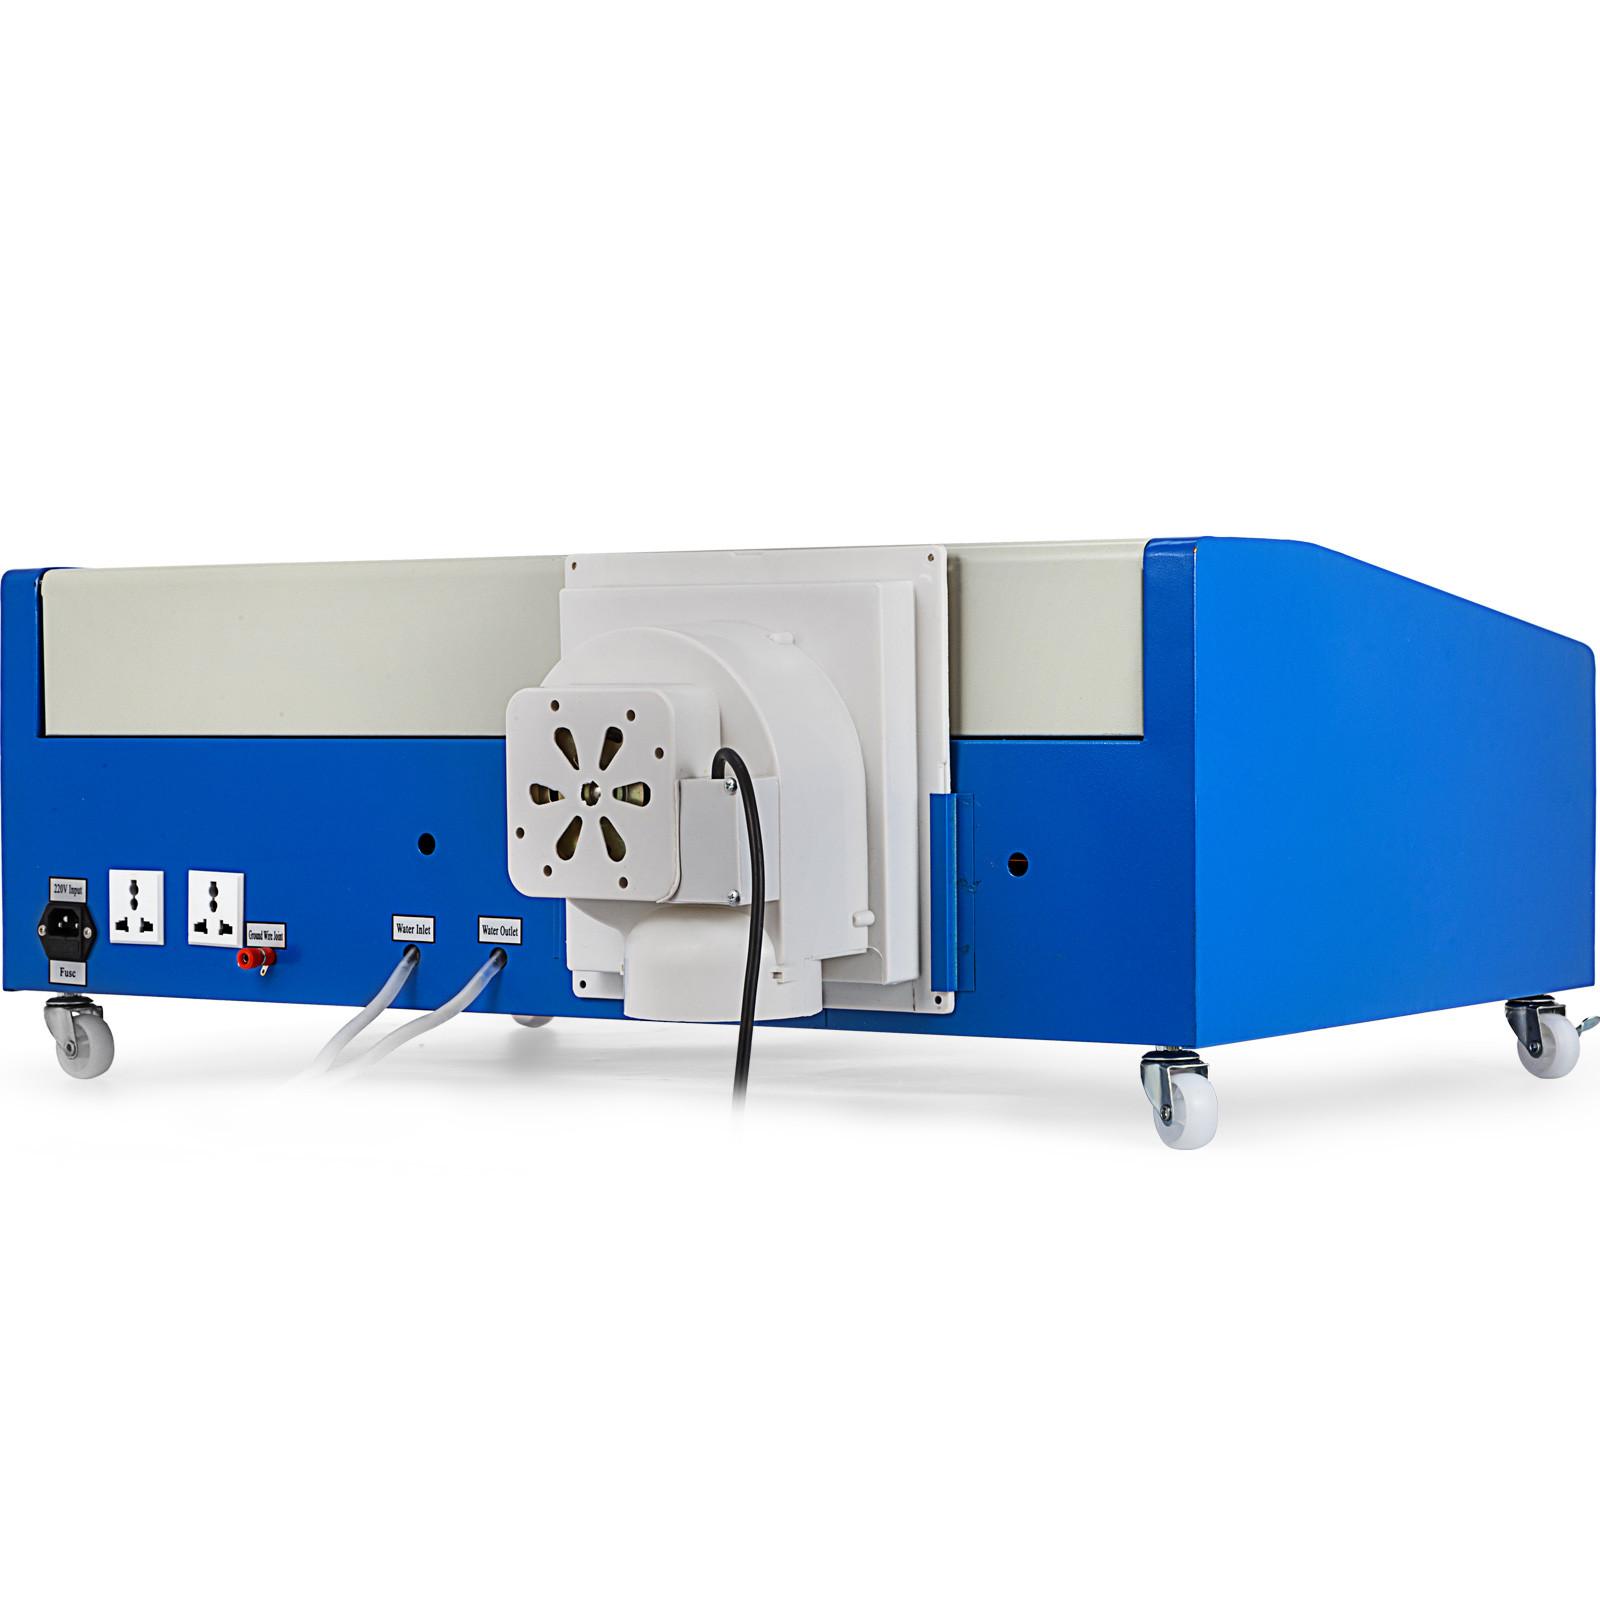 Macchina-per-Incisione-Laser-CO2-40-130W-Asse-Rotante-Tagliatrice-Incisore miniatura 98